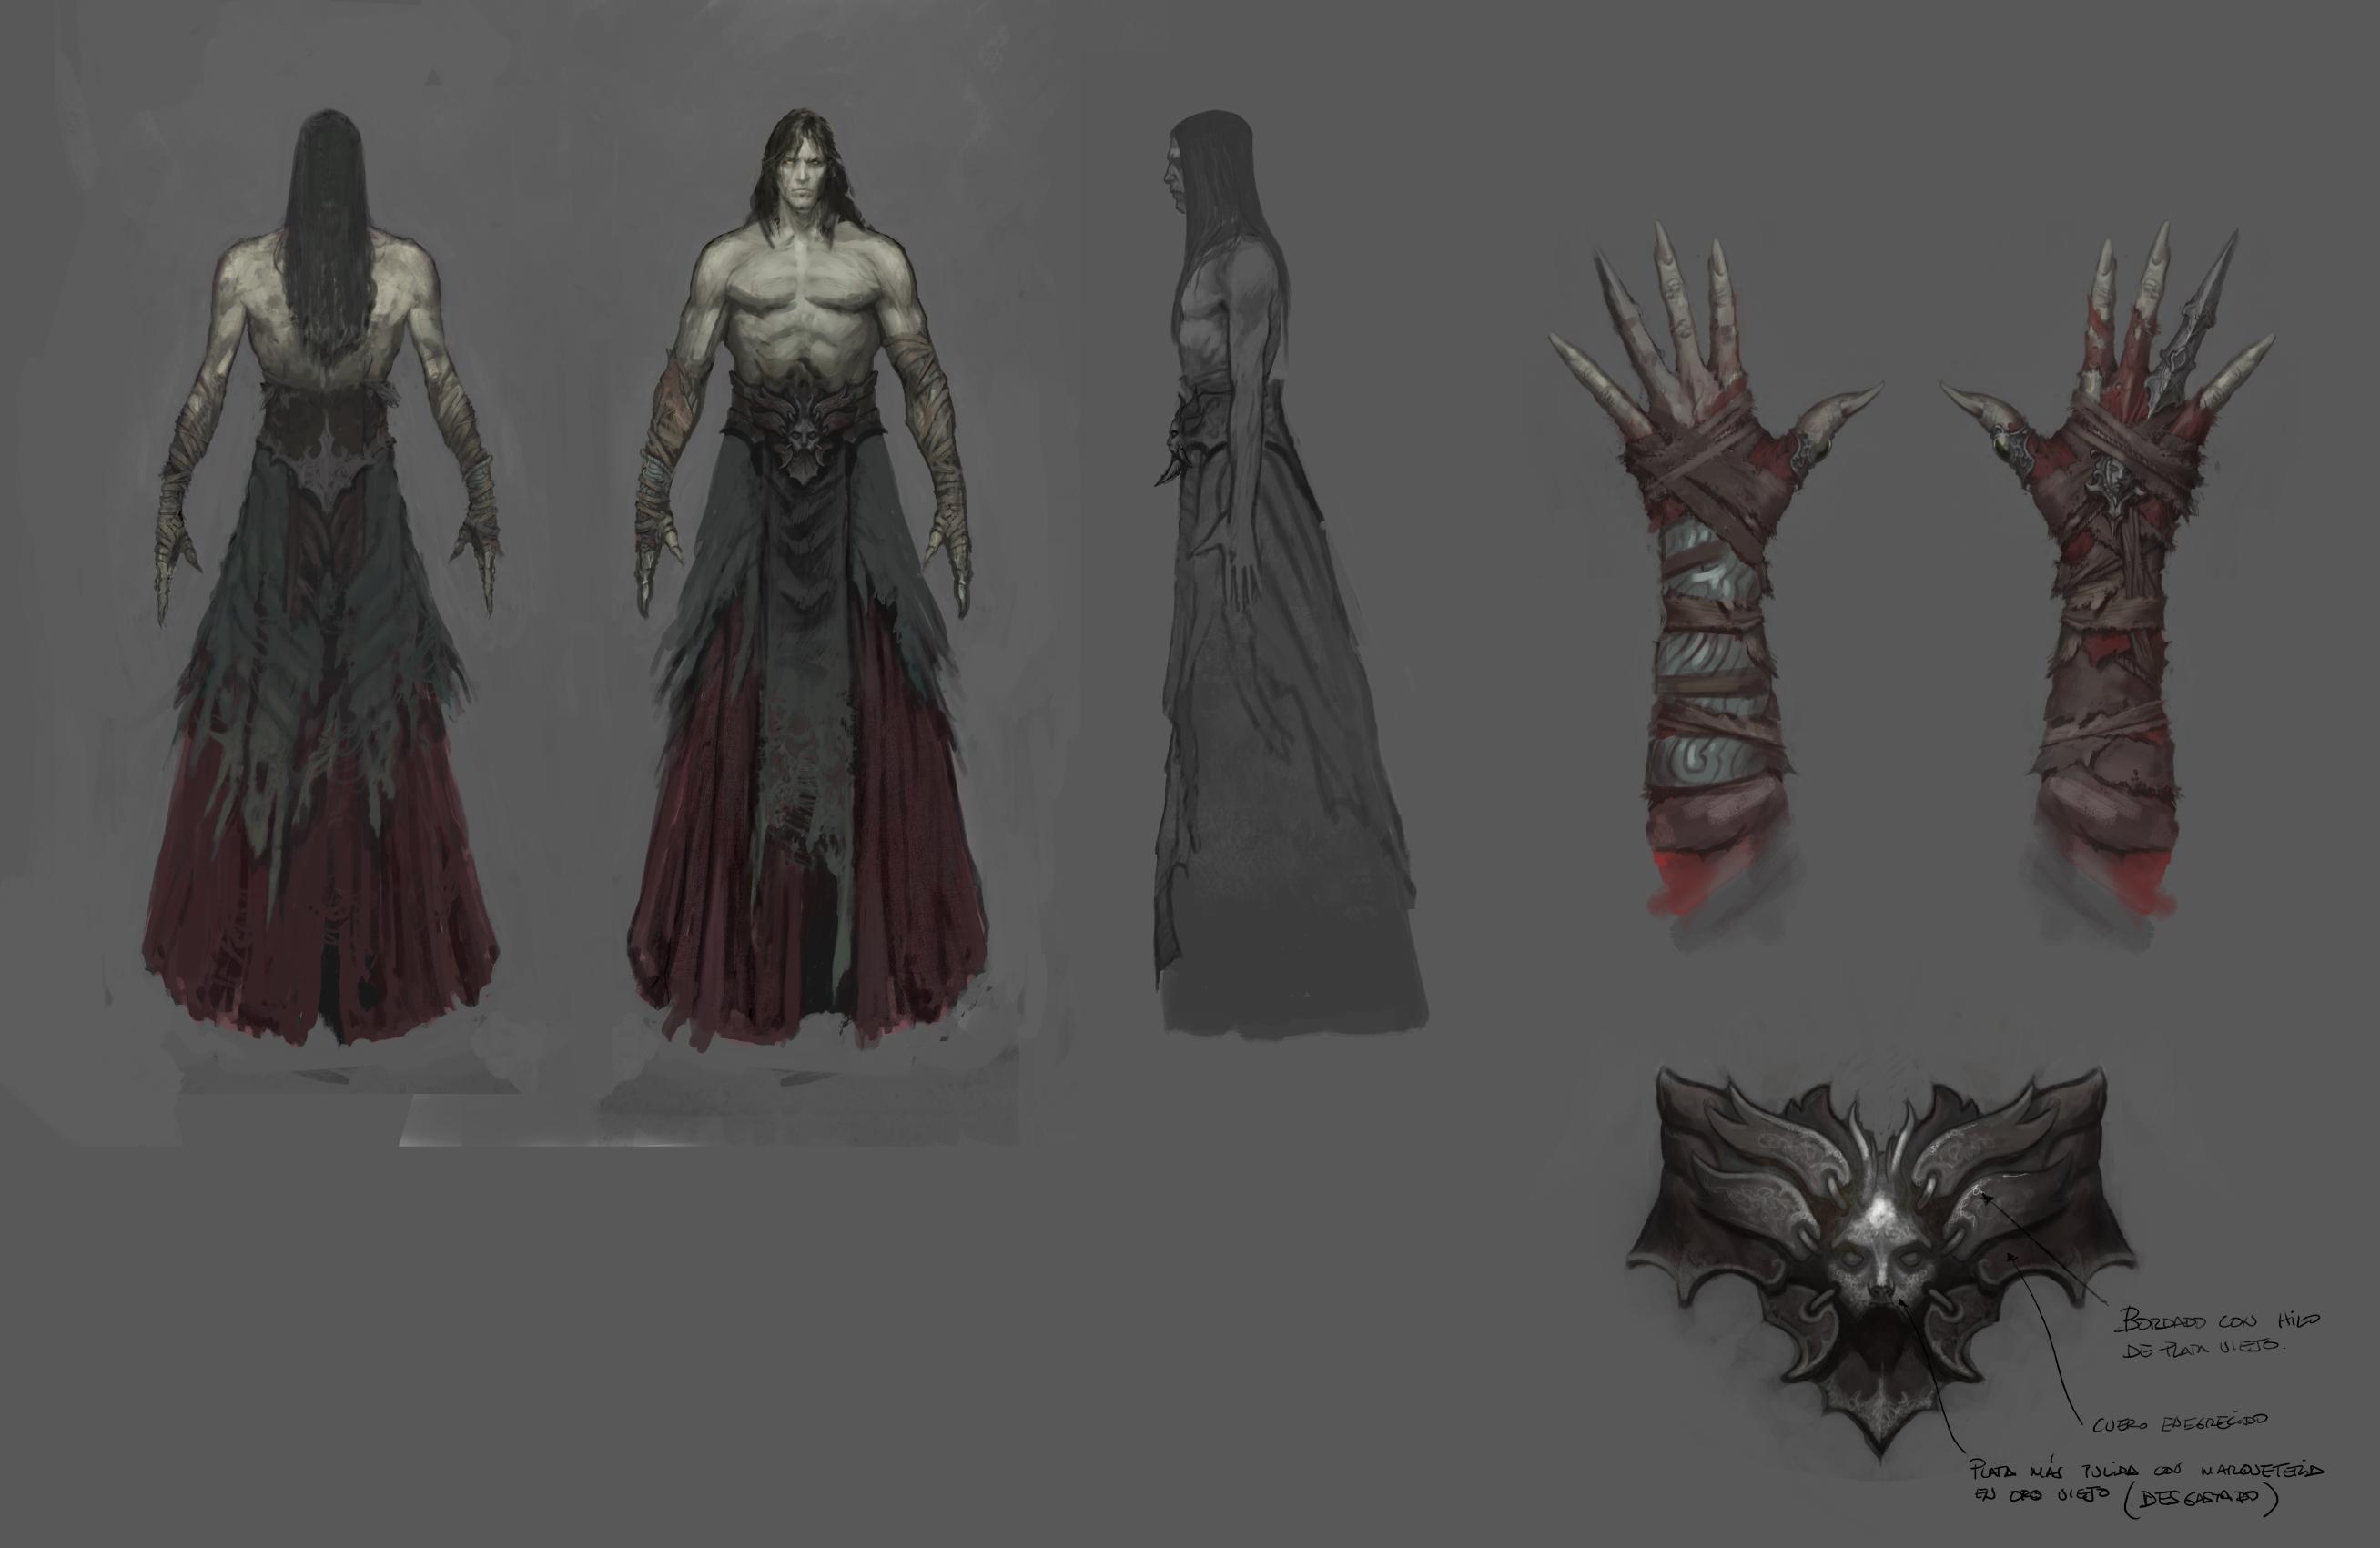 Sběratelská edice Castlevania: Lords of Shadow 2 89434